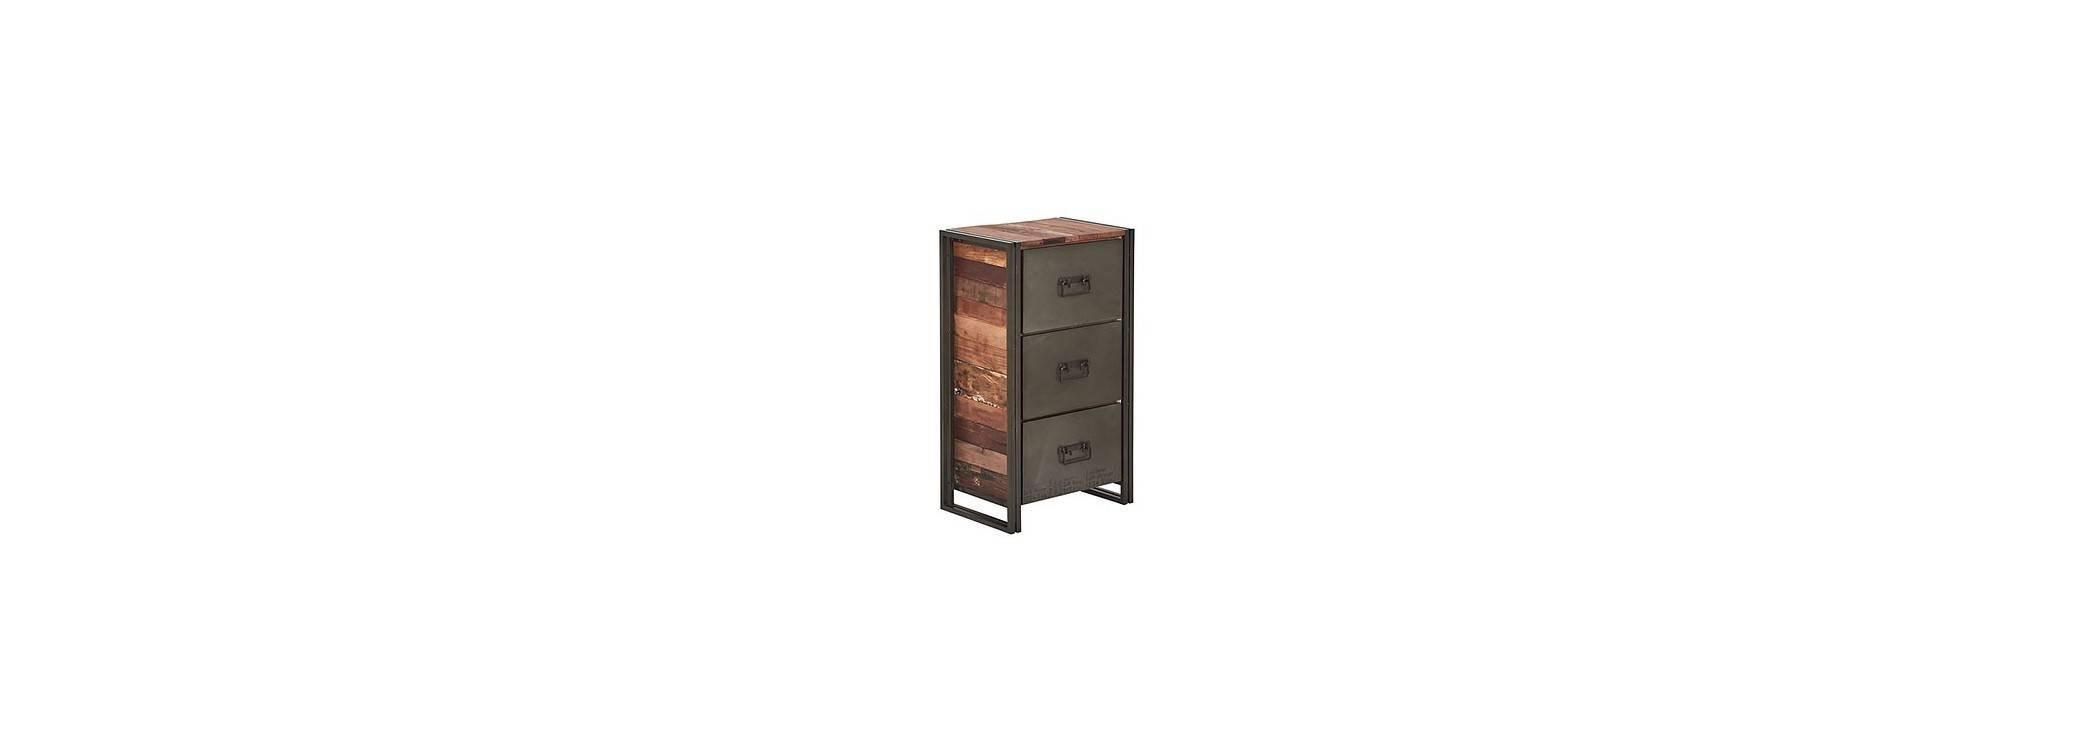 Meuble de rangement Edito, 3 tiroirs